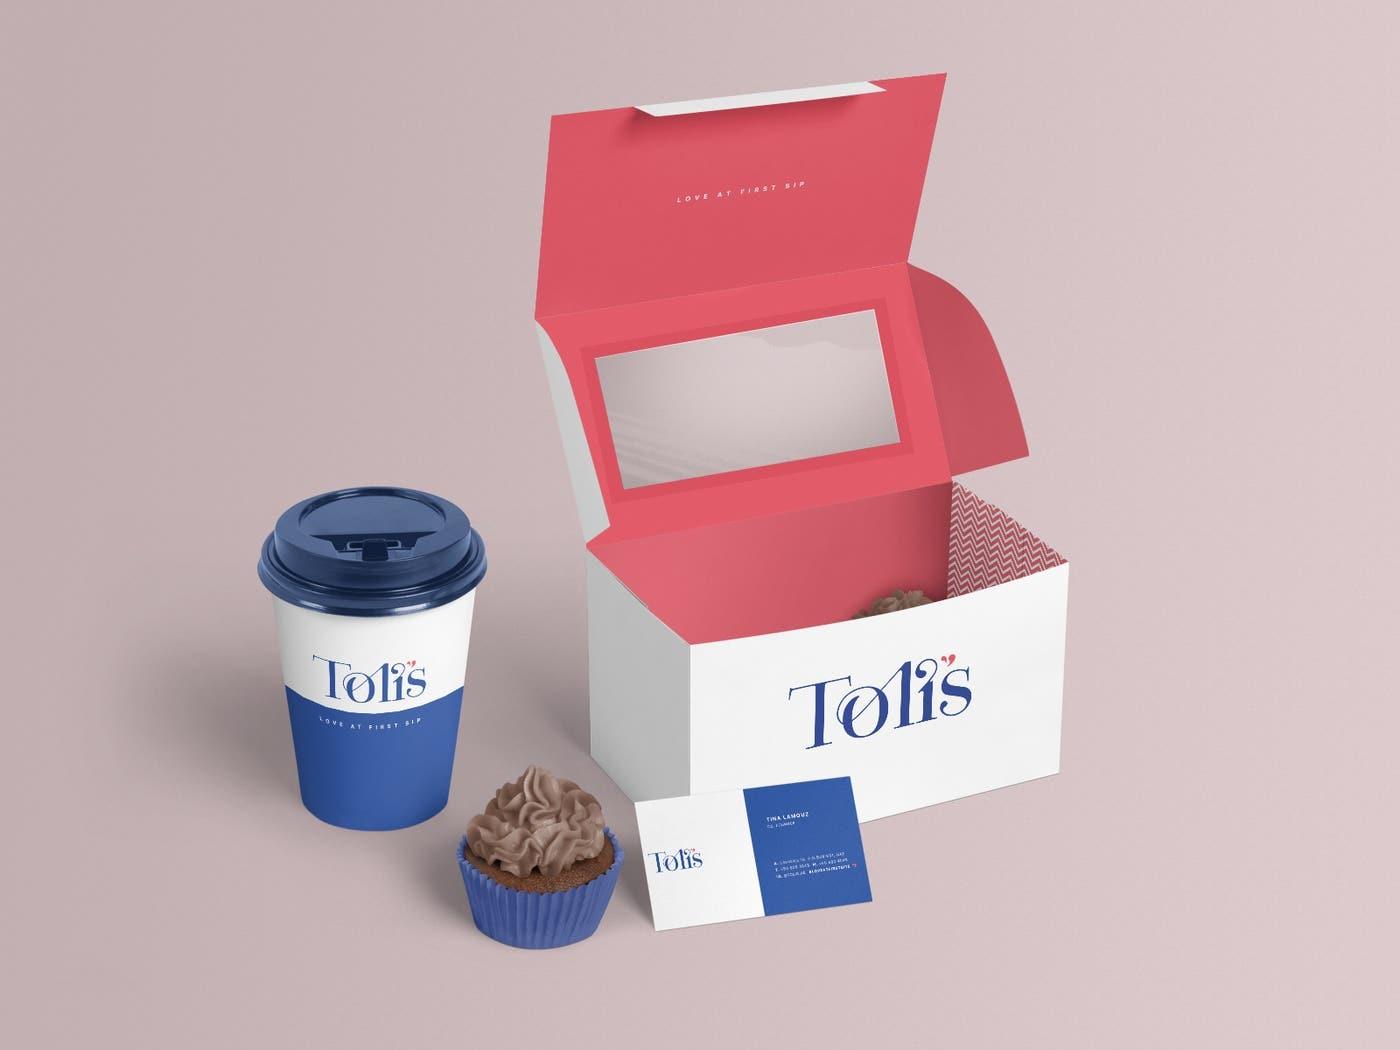 1792322-tolis-cafe-_1600x1200.jpg